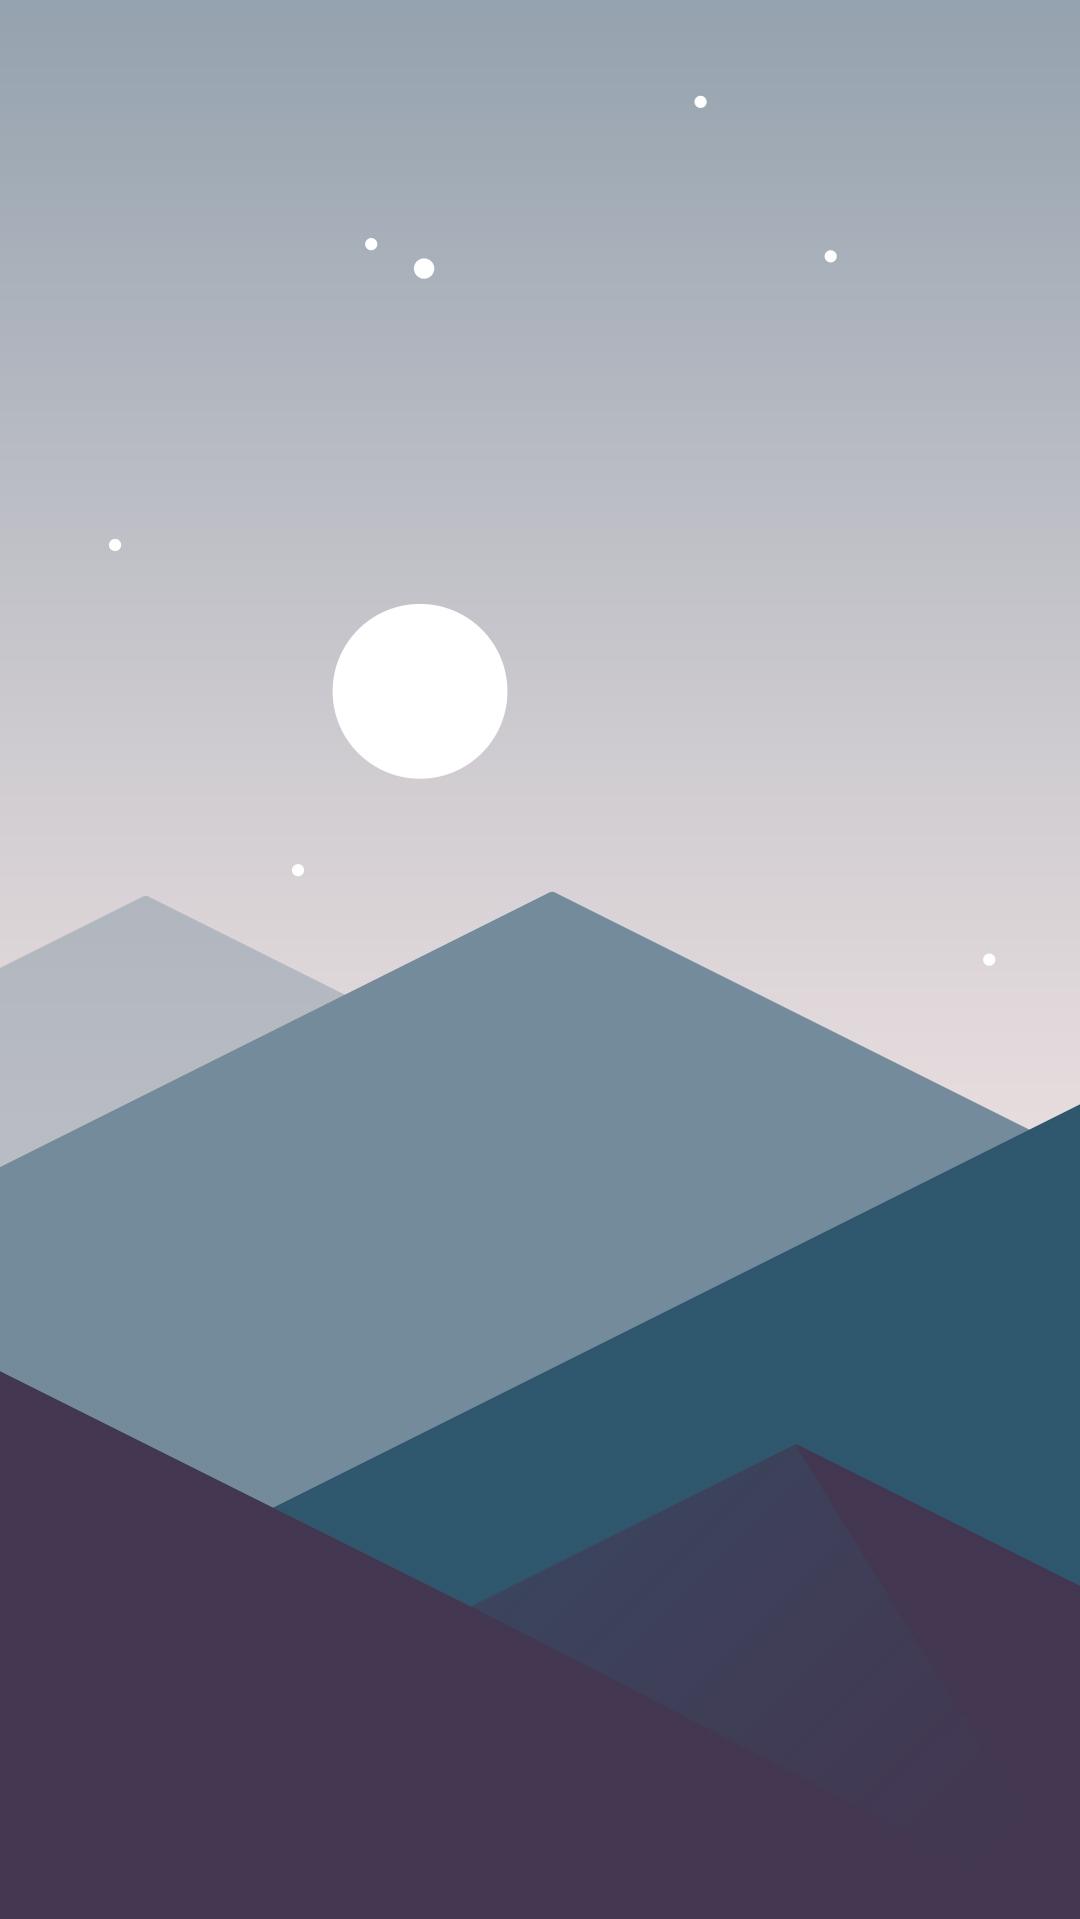 Good Wallpaper Mountain Minimalistic - Minimalistic-Mountains-Night-Moon-iPhone-Wallpaper-iphoneswallpapers_com  You Should Have_908062.jpg